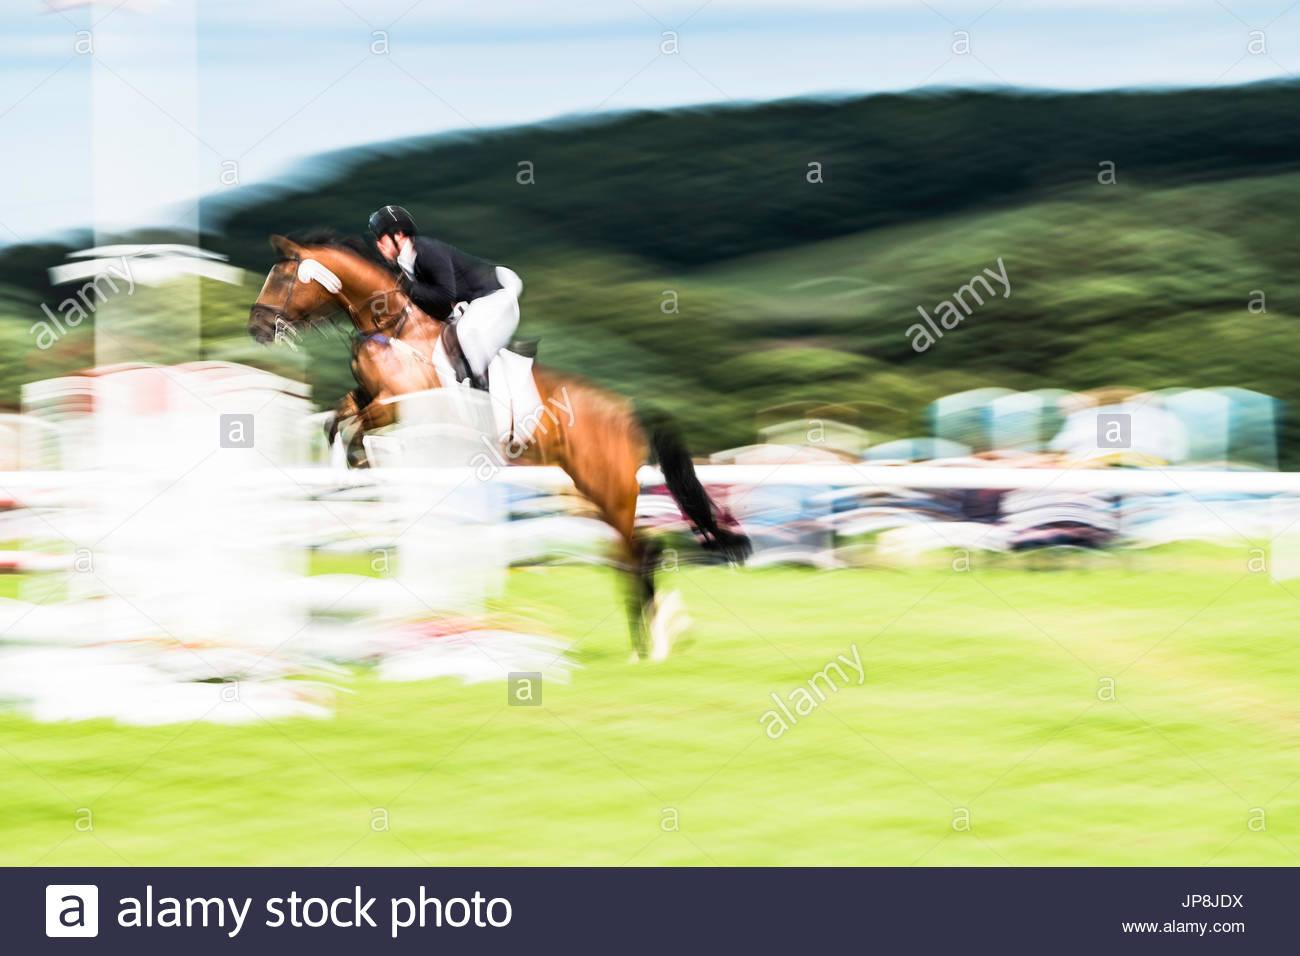 Burgham, Morpeth, Northumberland, UK. 28/29. Juli 2017. Vielseitigkeitsreiter konkurrieren auf Burgham International Stockbild